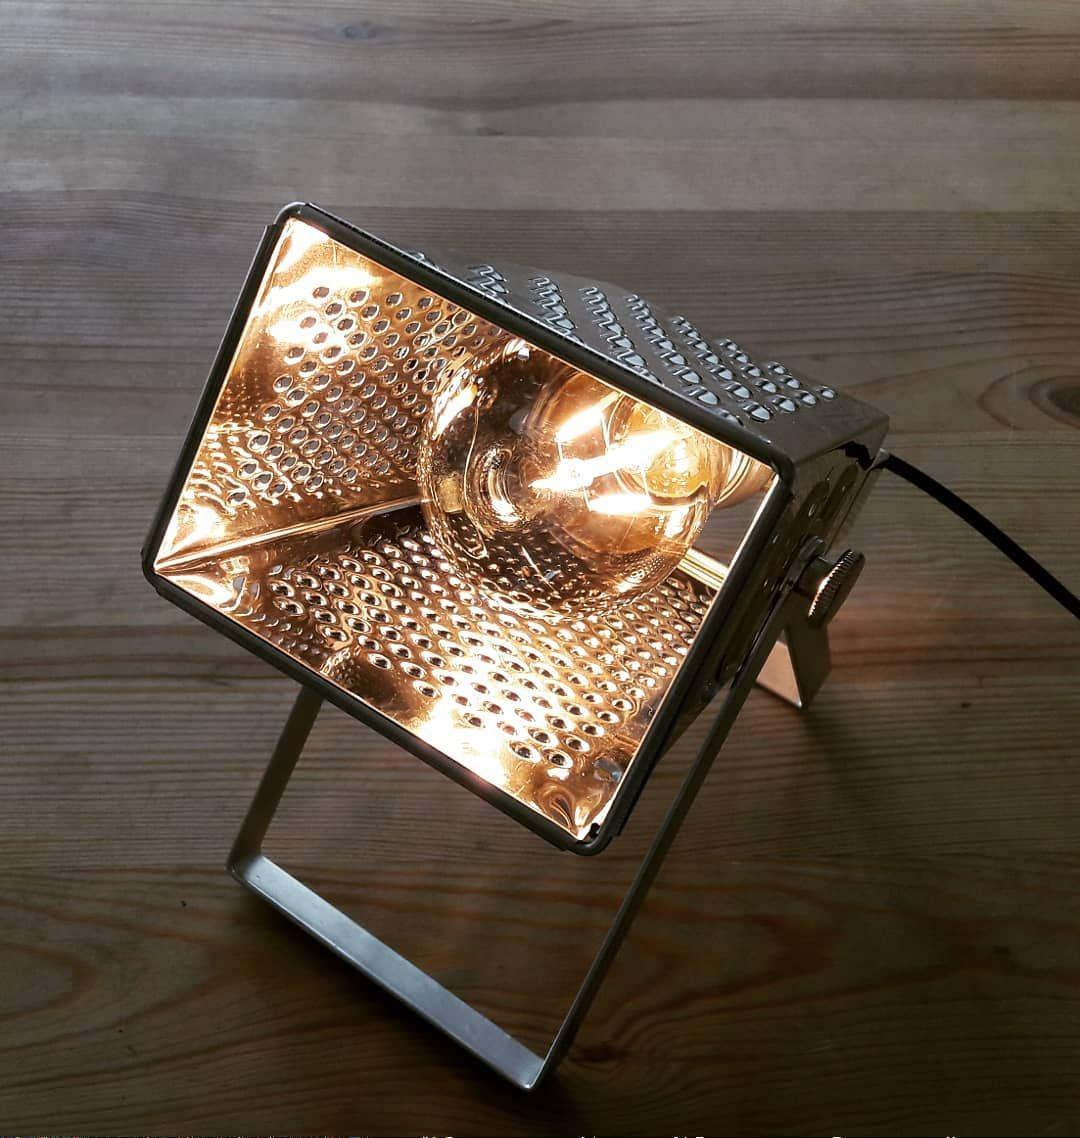 #upcycling #grater #kitchen #lamp #diy #light #industrial #küchenreibe #tischlampen #kücheninspiration #upcycle